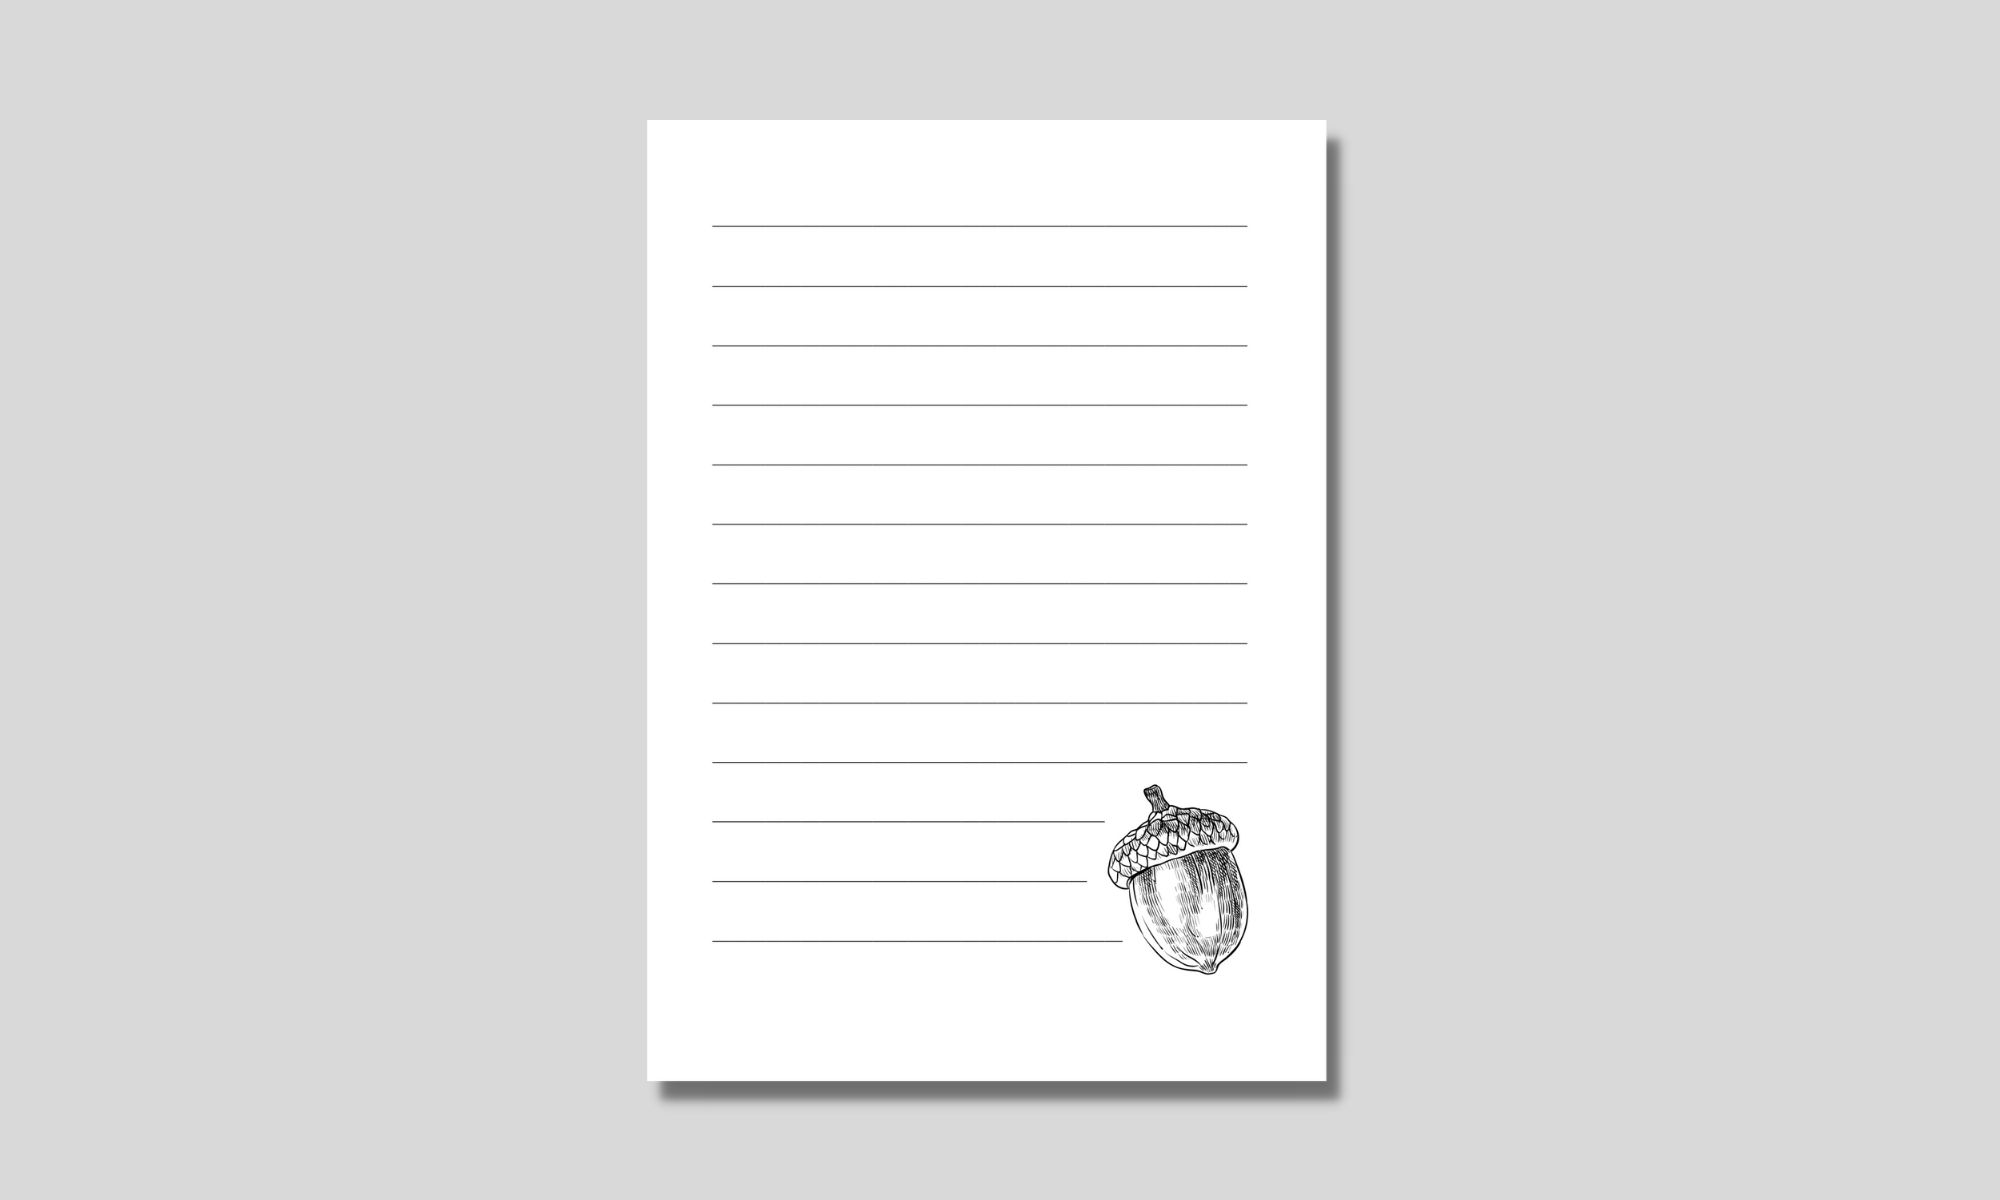 enkelt linjerat papper med ekollon